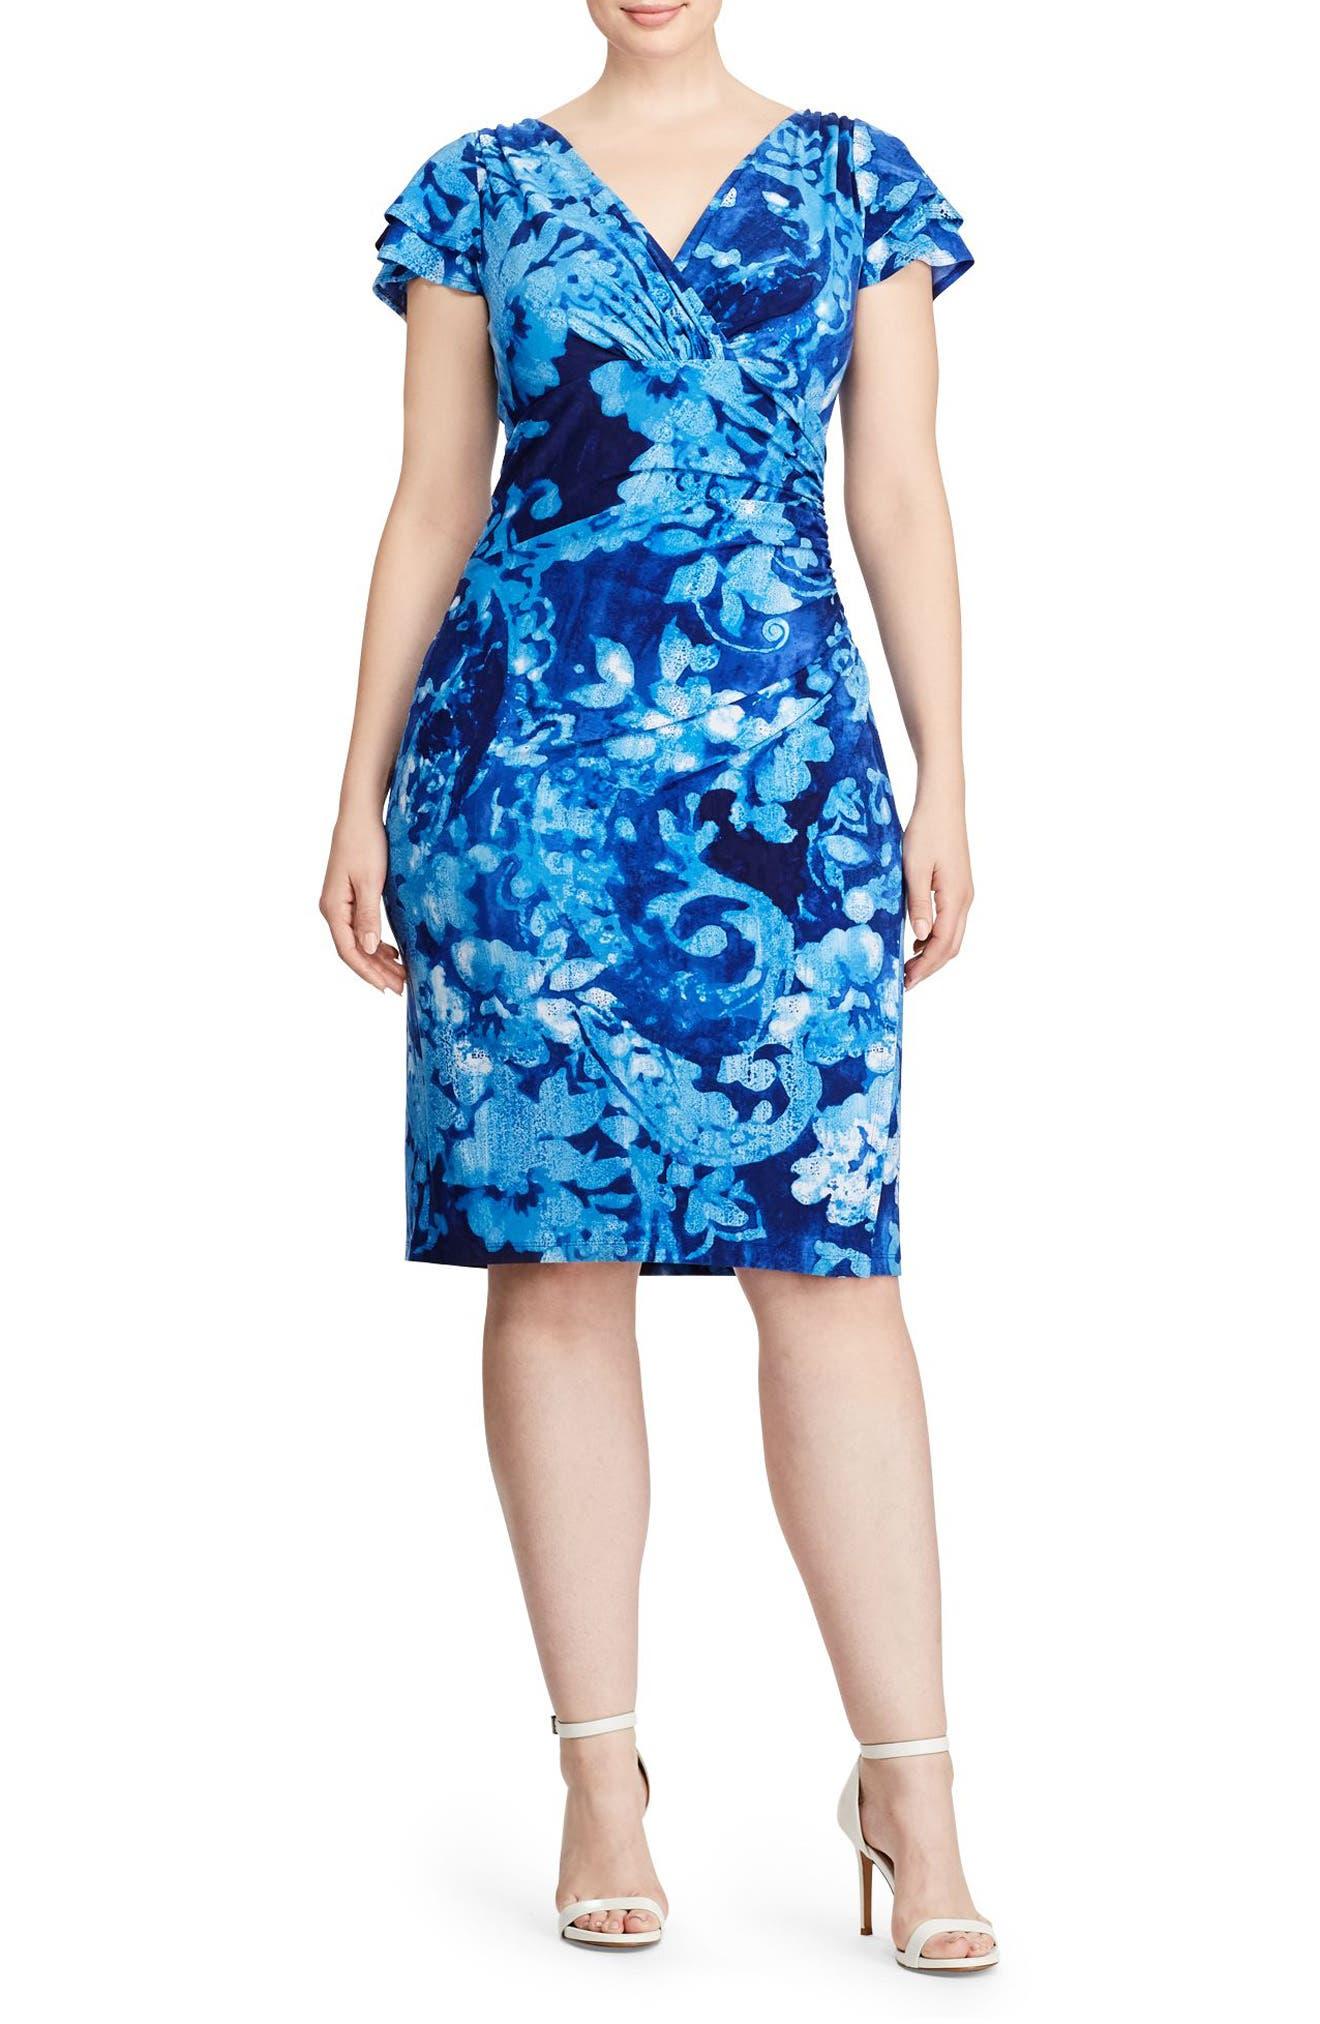 Alternate Image 1 Selected - Lauren Ralph Lauren Sheath Dress (Plus Size)